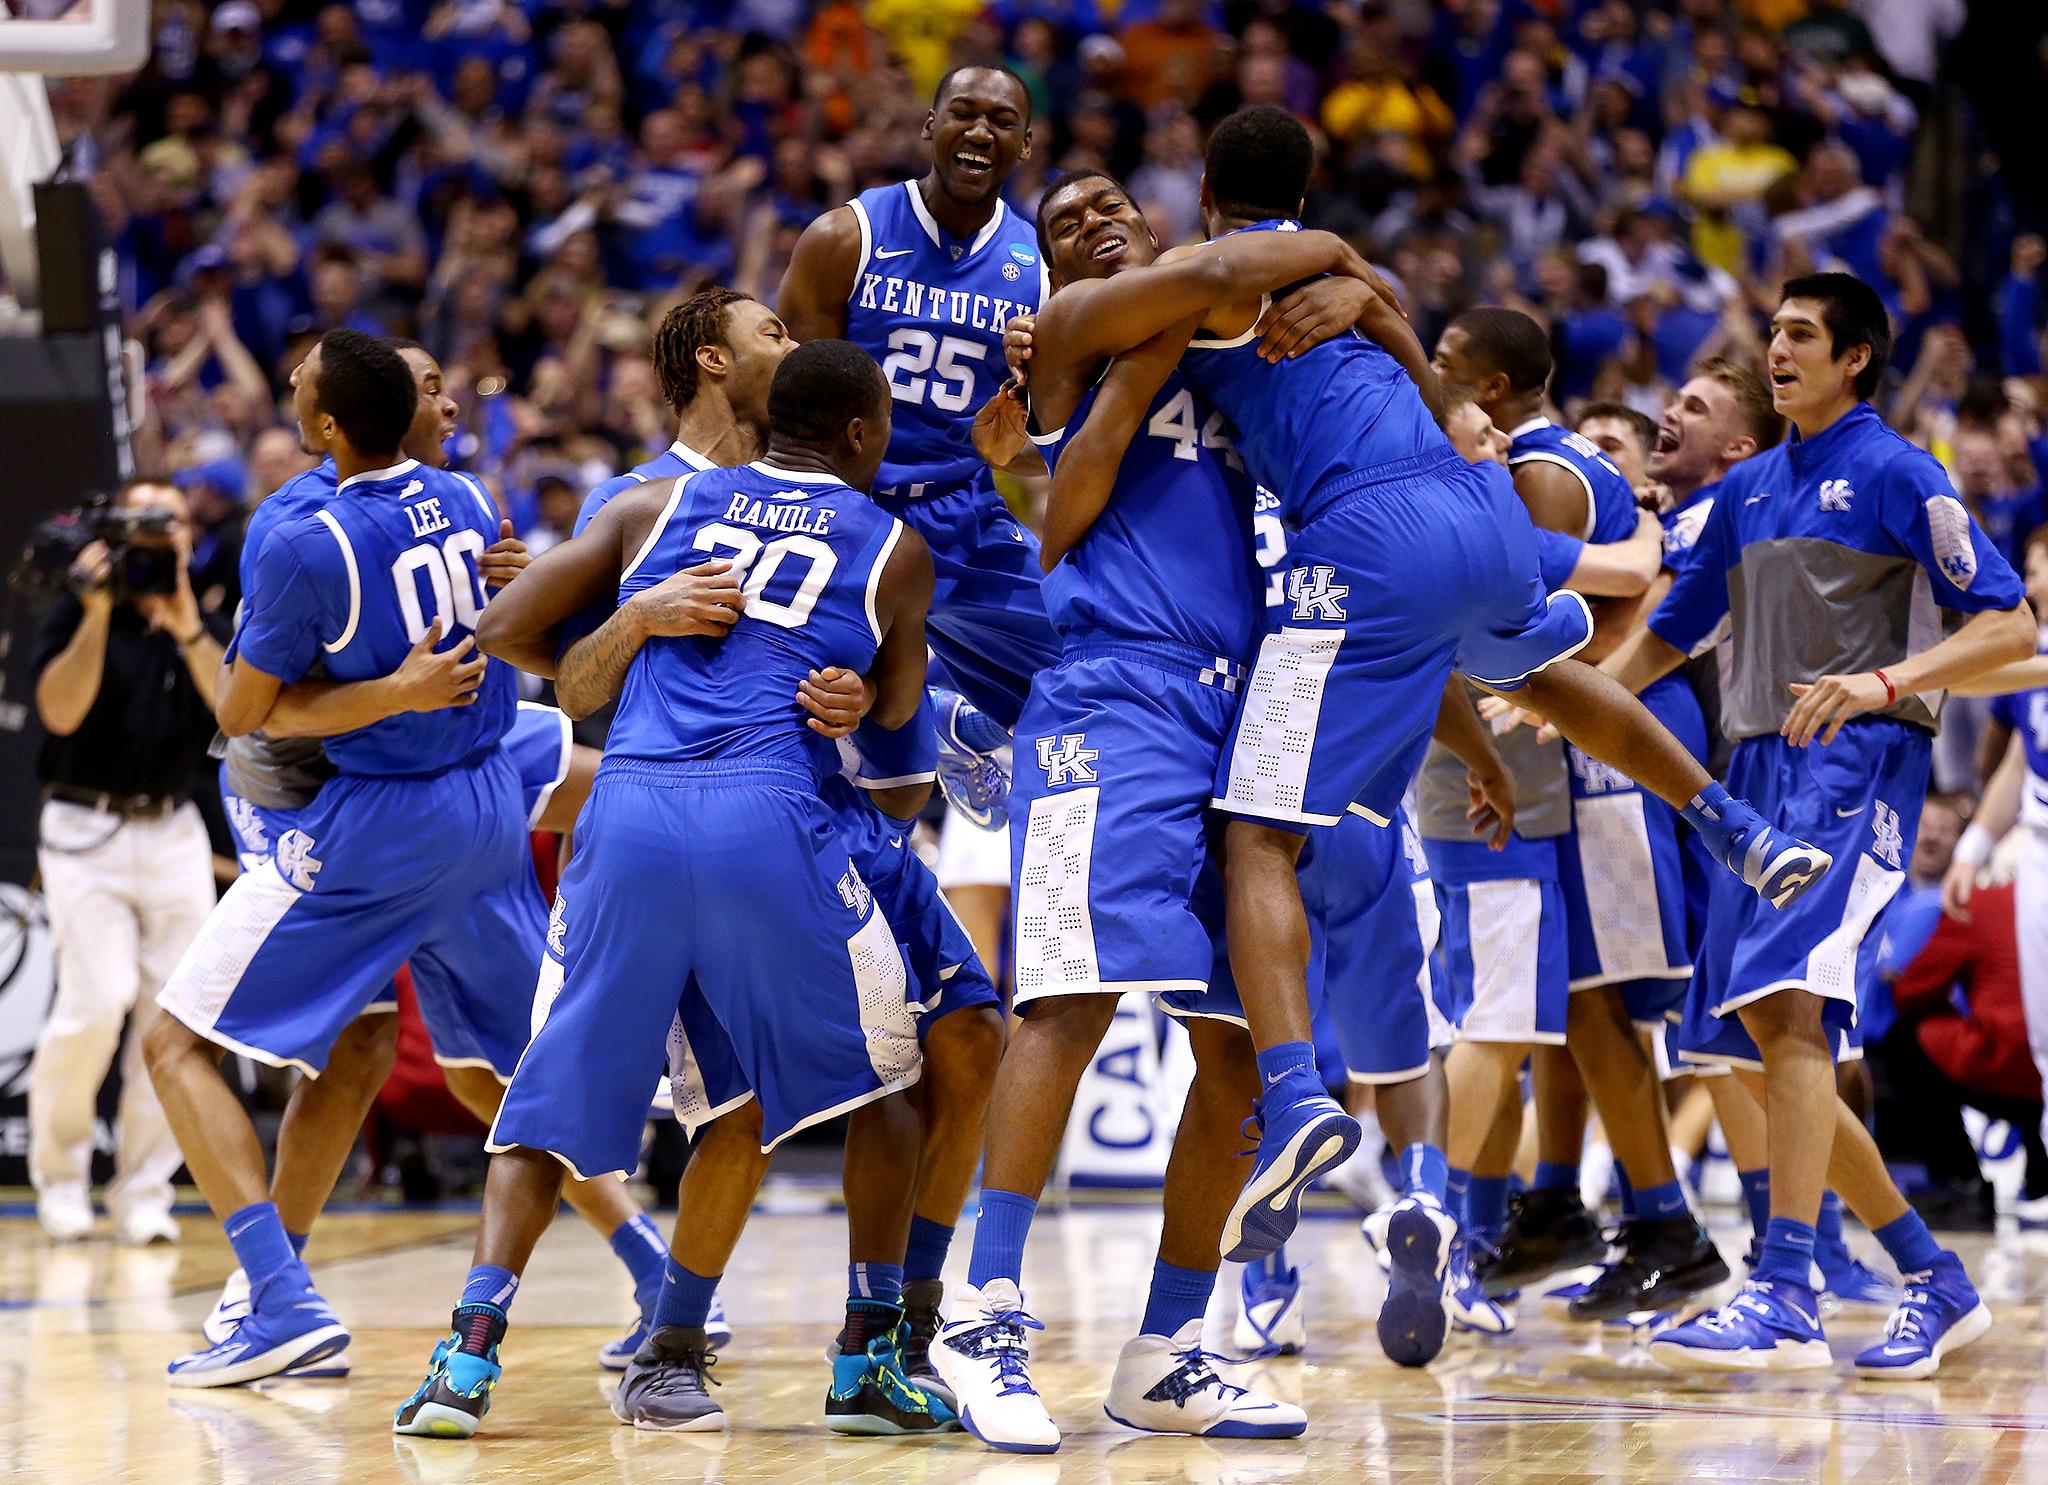 Kentucky Celebrates